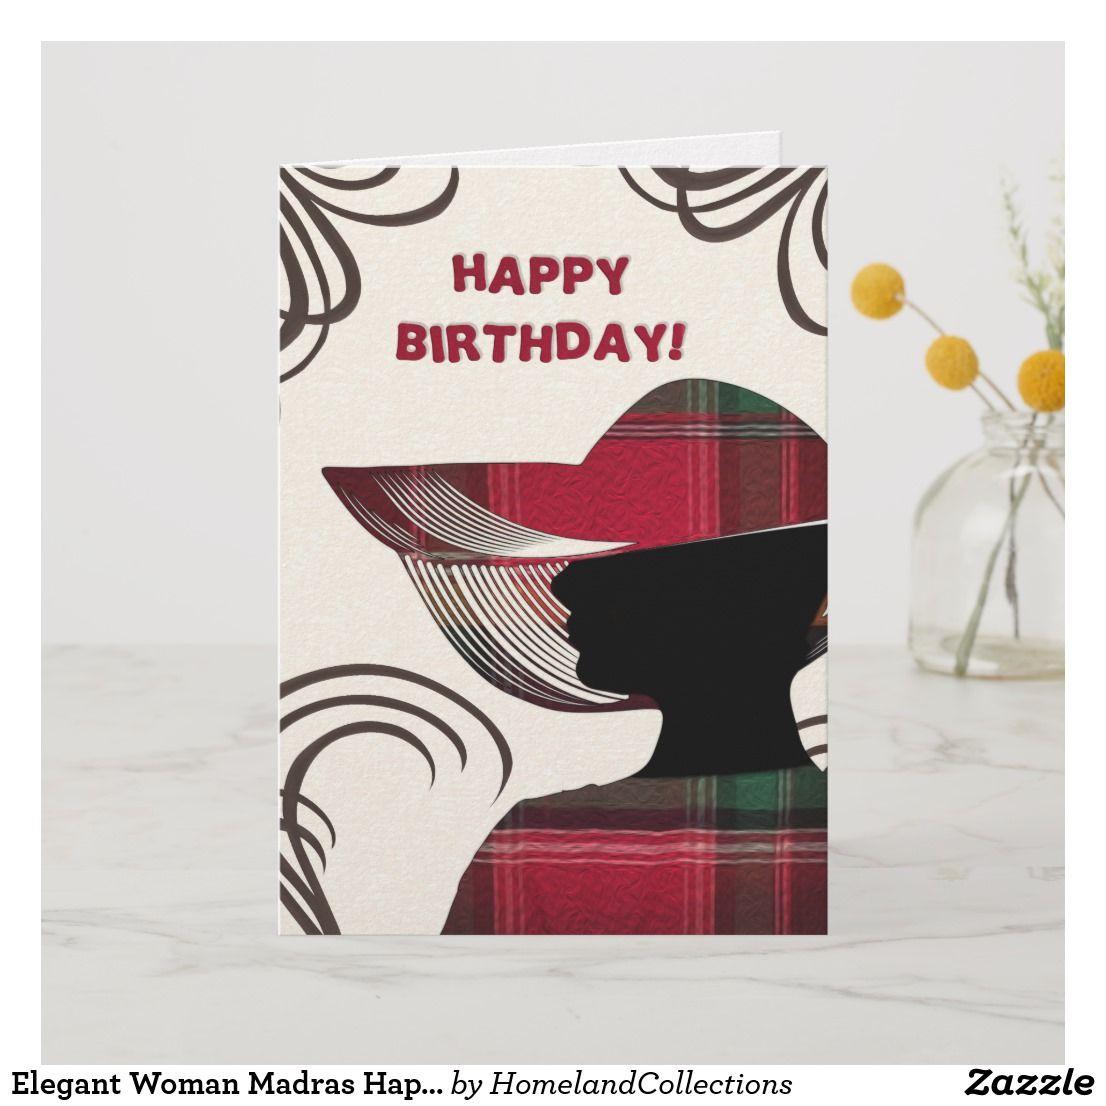 Elegant Woman Madras Happy Birthday Greeting Card